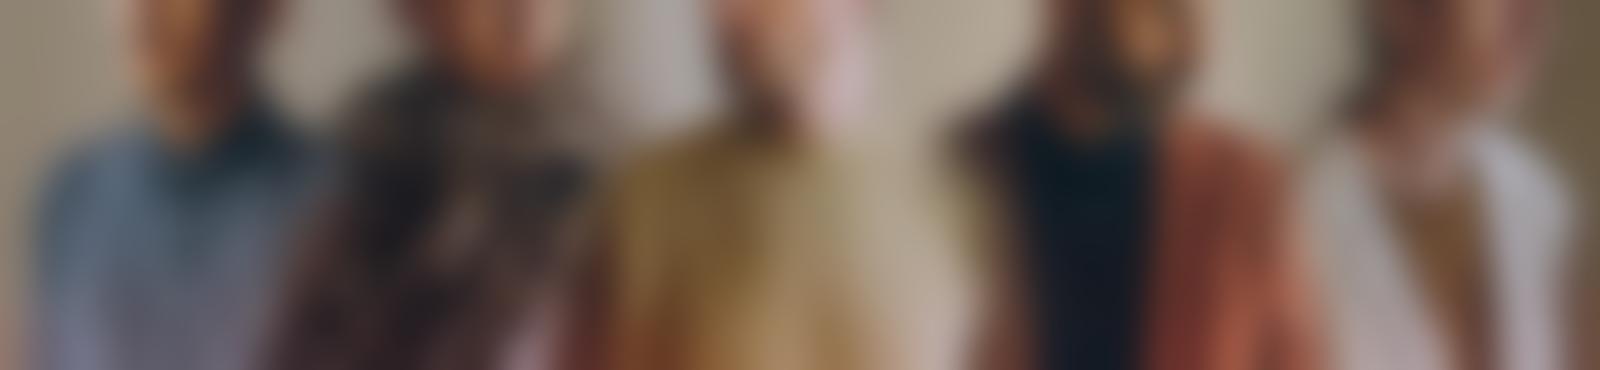 Blurred 62c973b9 a761 4233 826c 44030507ff36